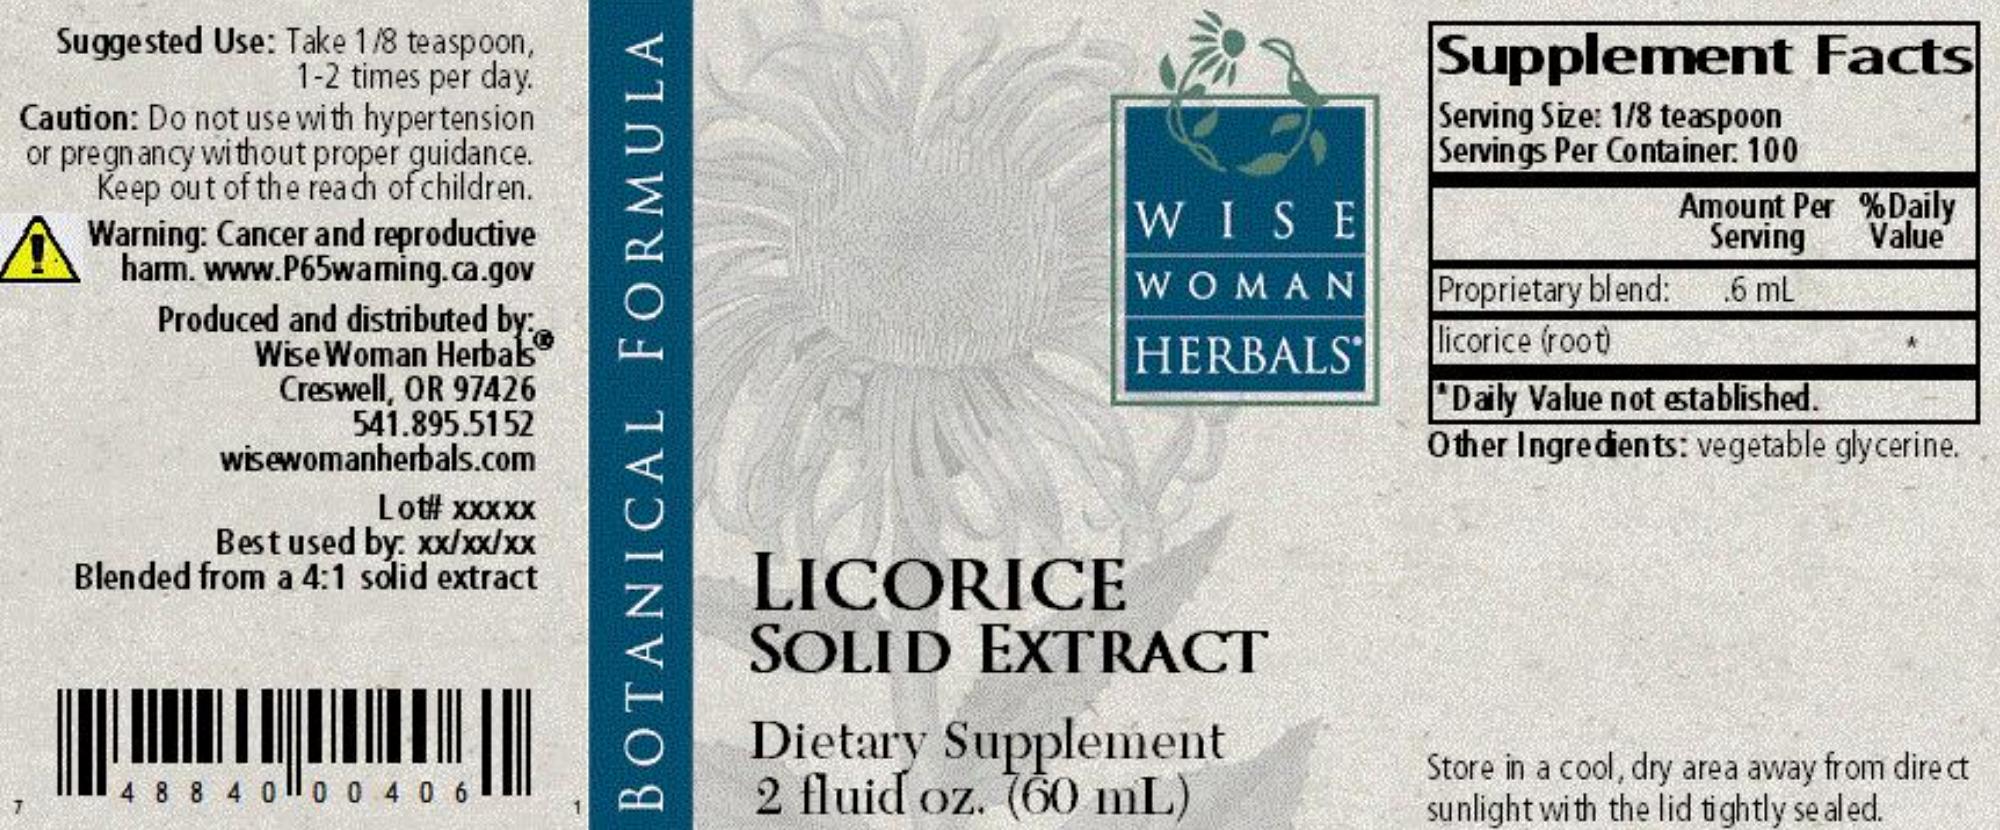 Licorice Solid Extract